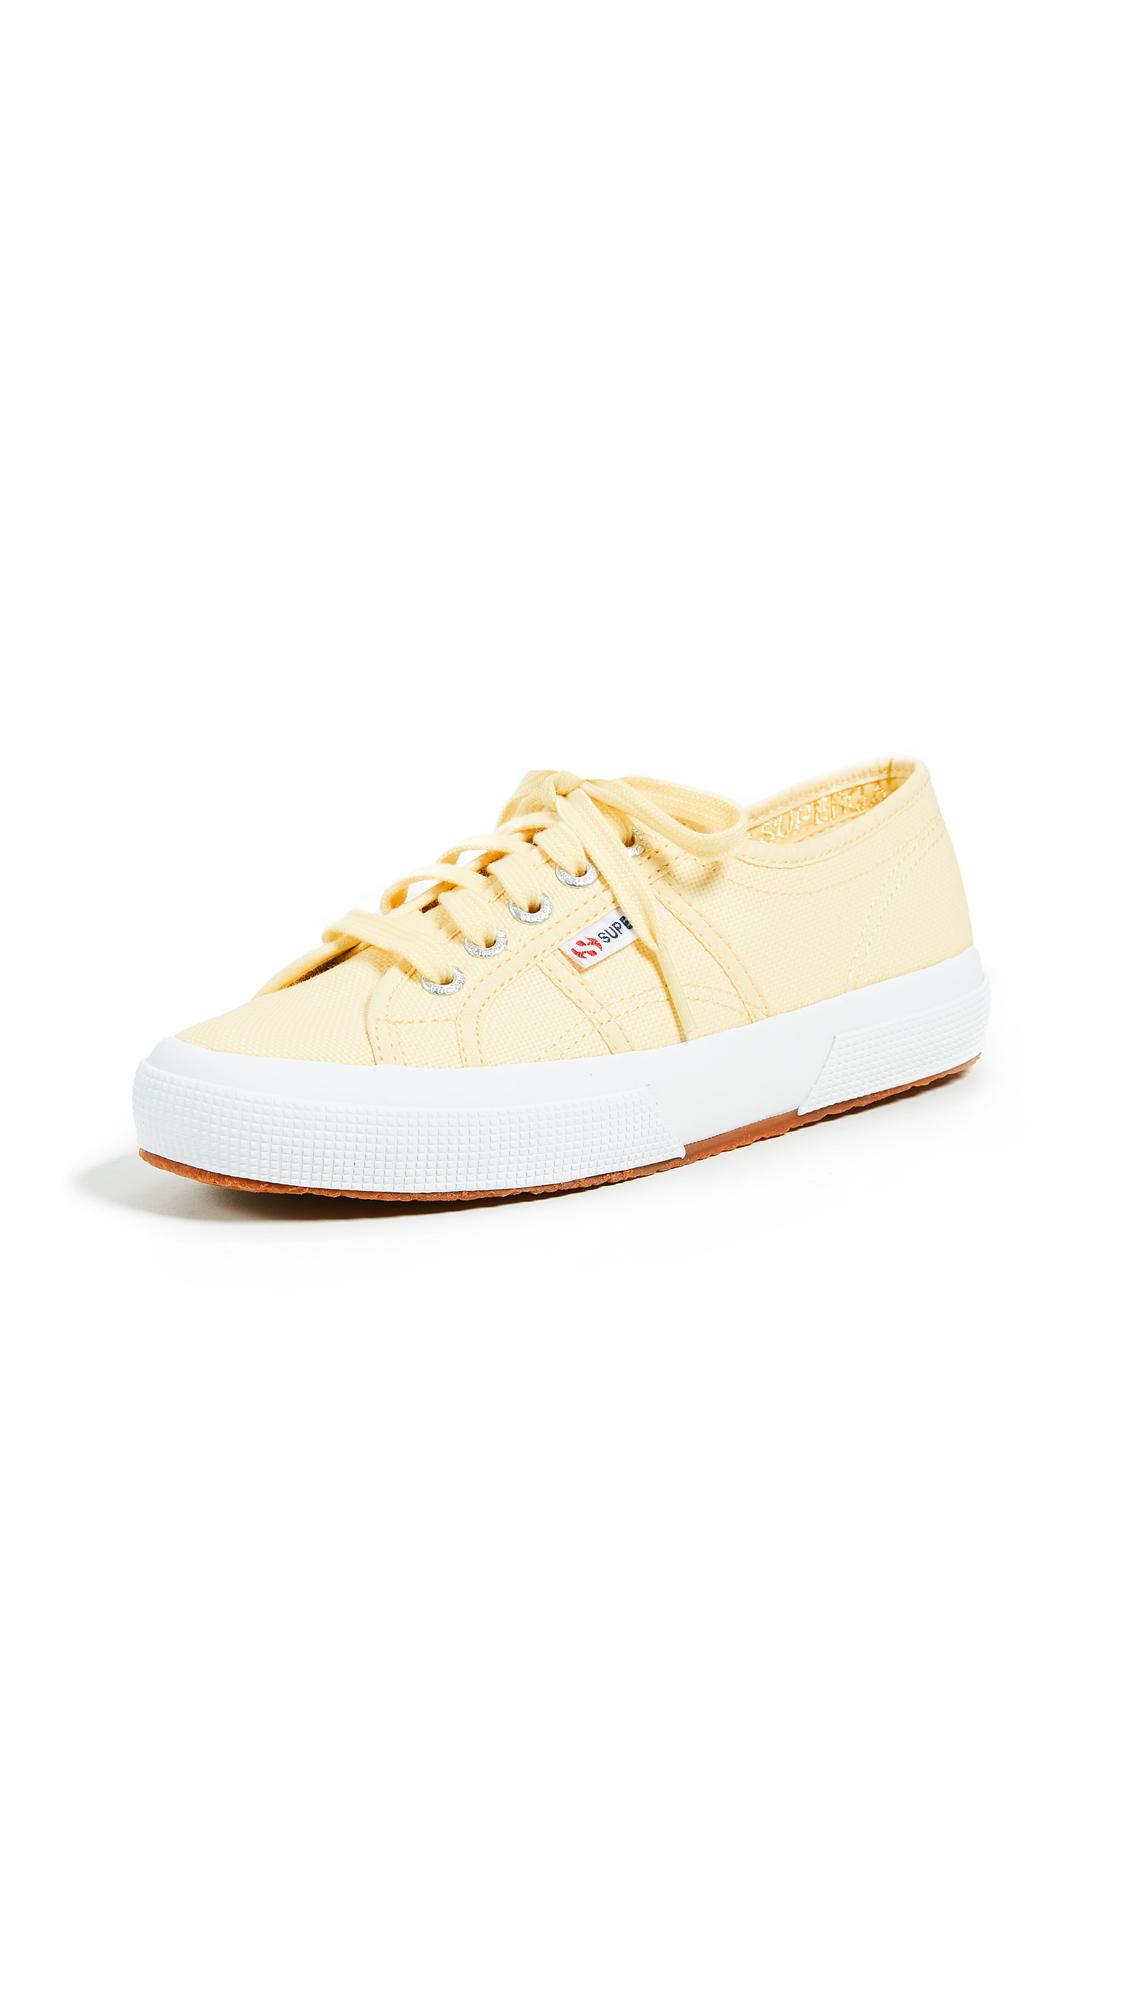 dd21188fd7c38 Superga 2750 Cotu Classic Sneakers In Yellow | ModeSens